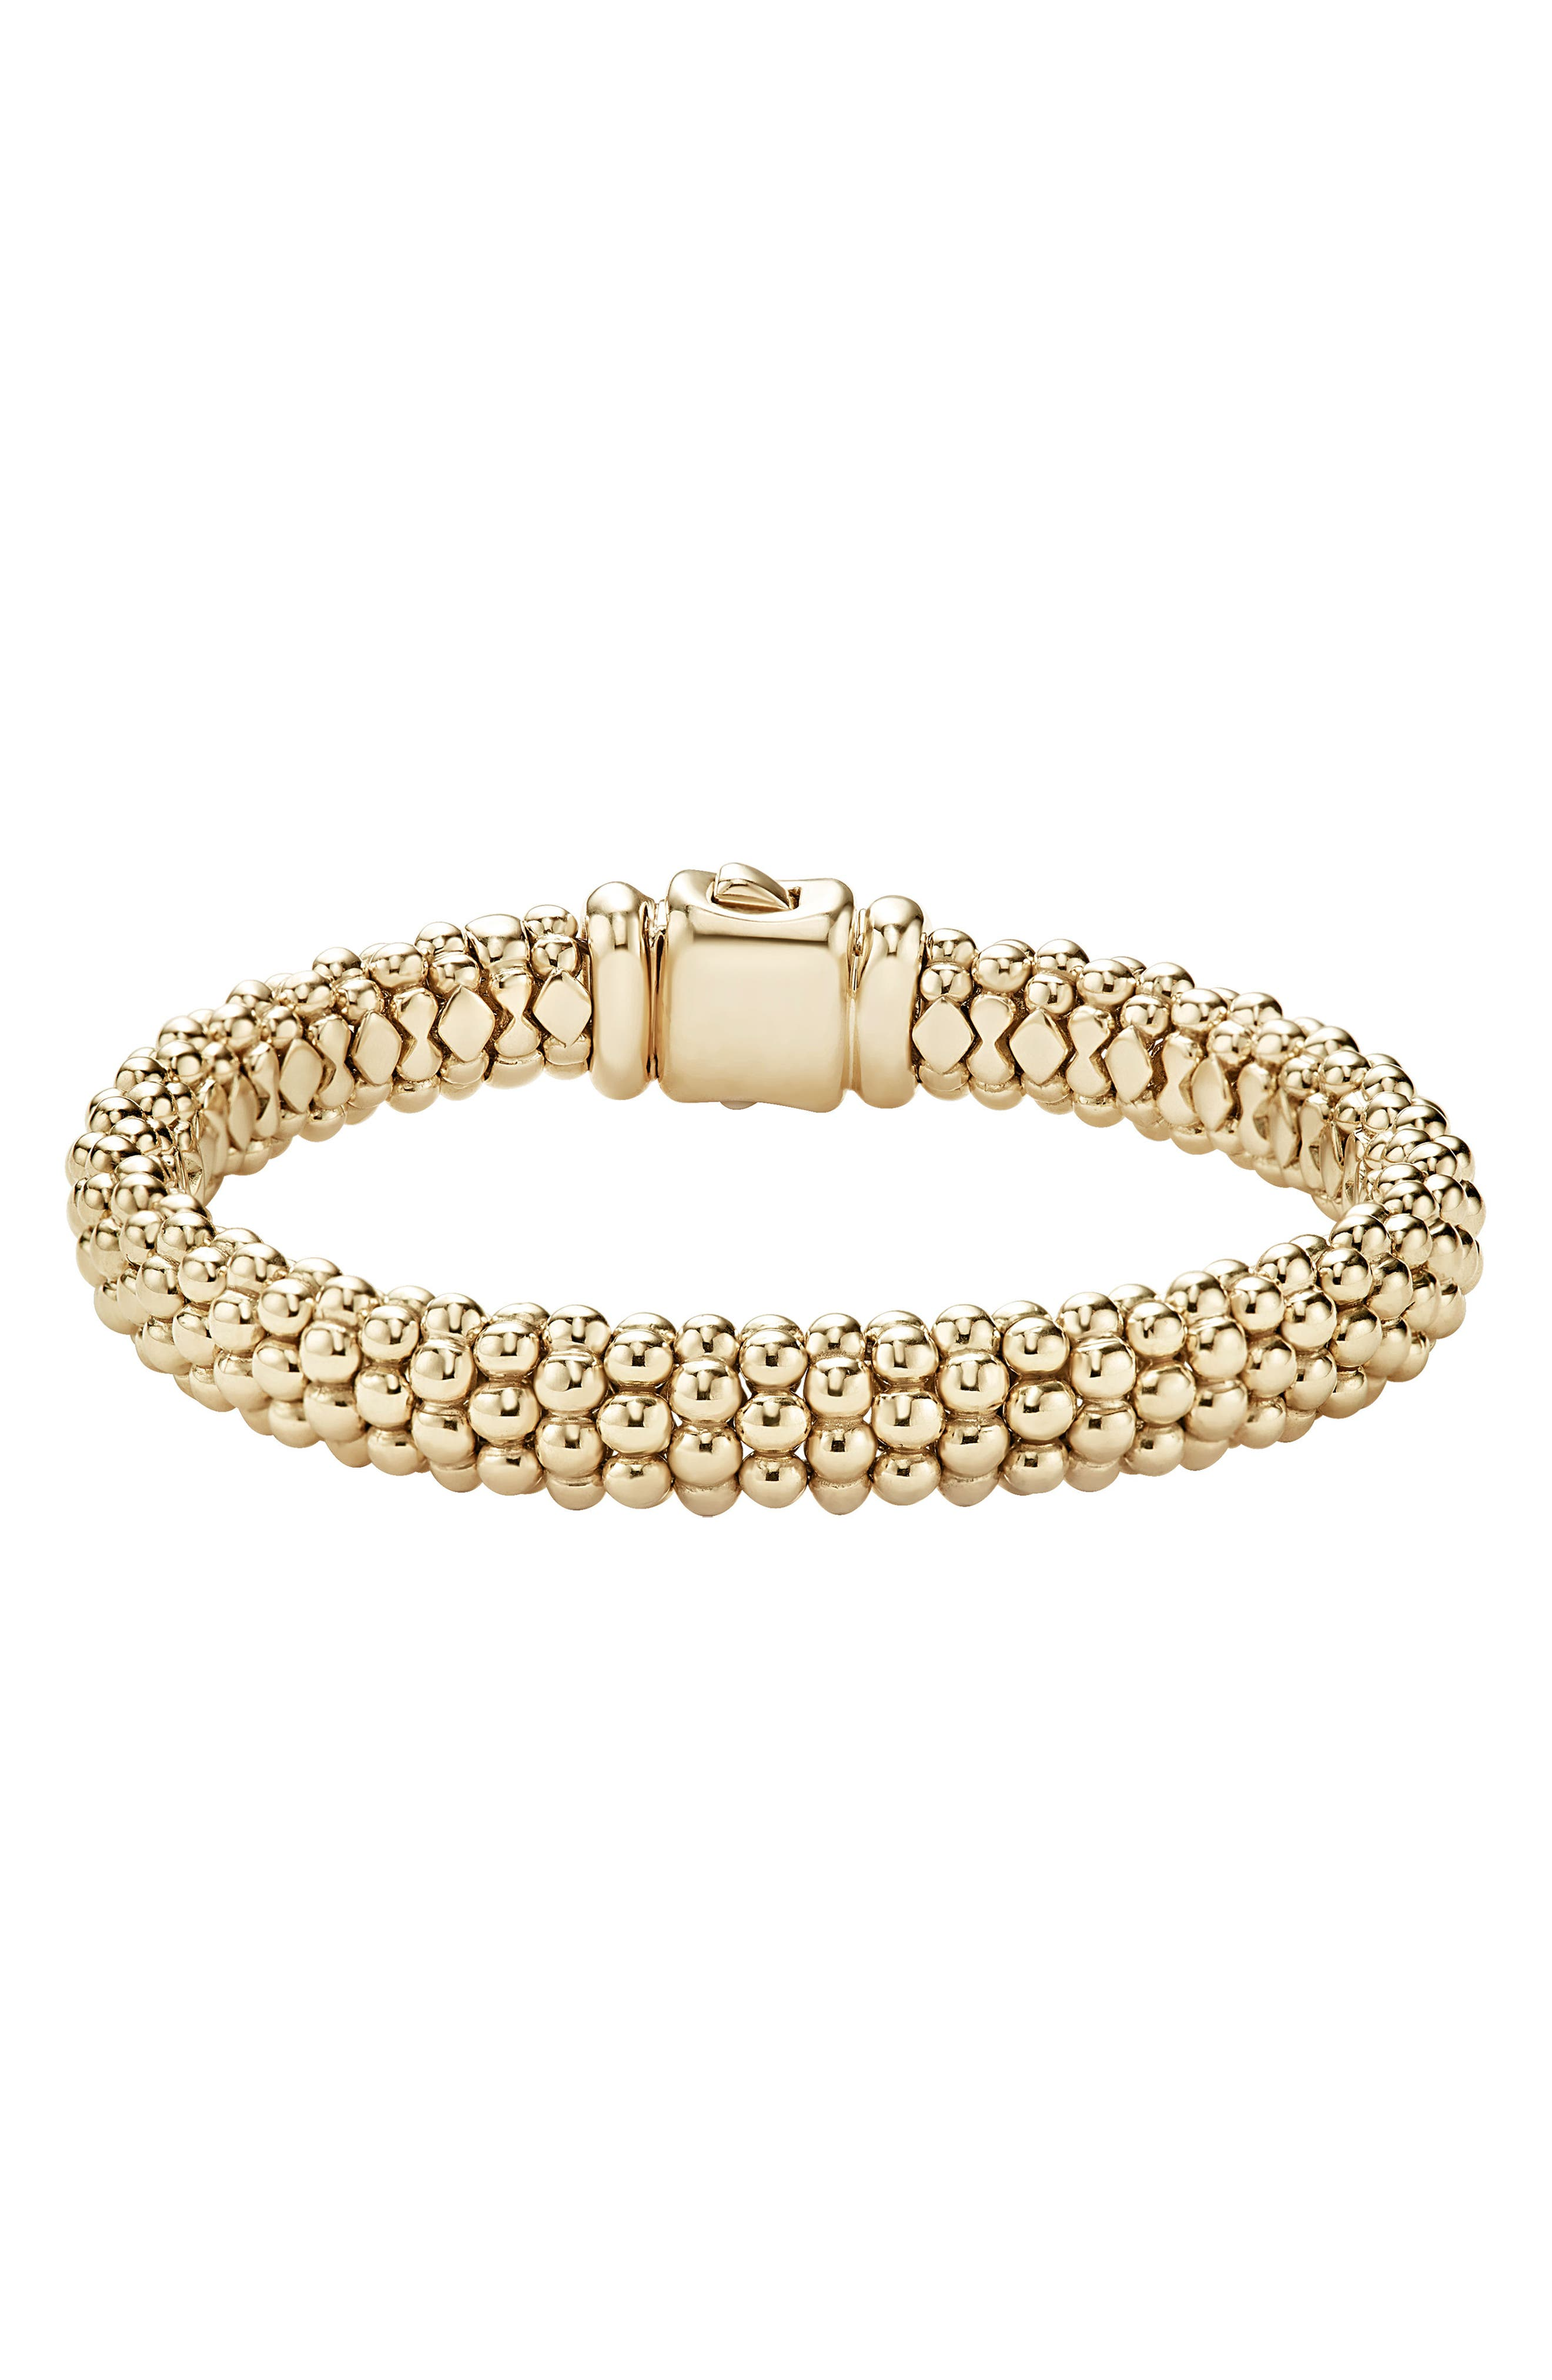 'Caviar Gold' Rope Bracelet,                             Alternate thumbnail 4, color,                             GOLD